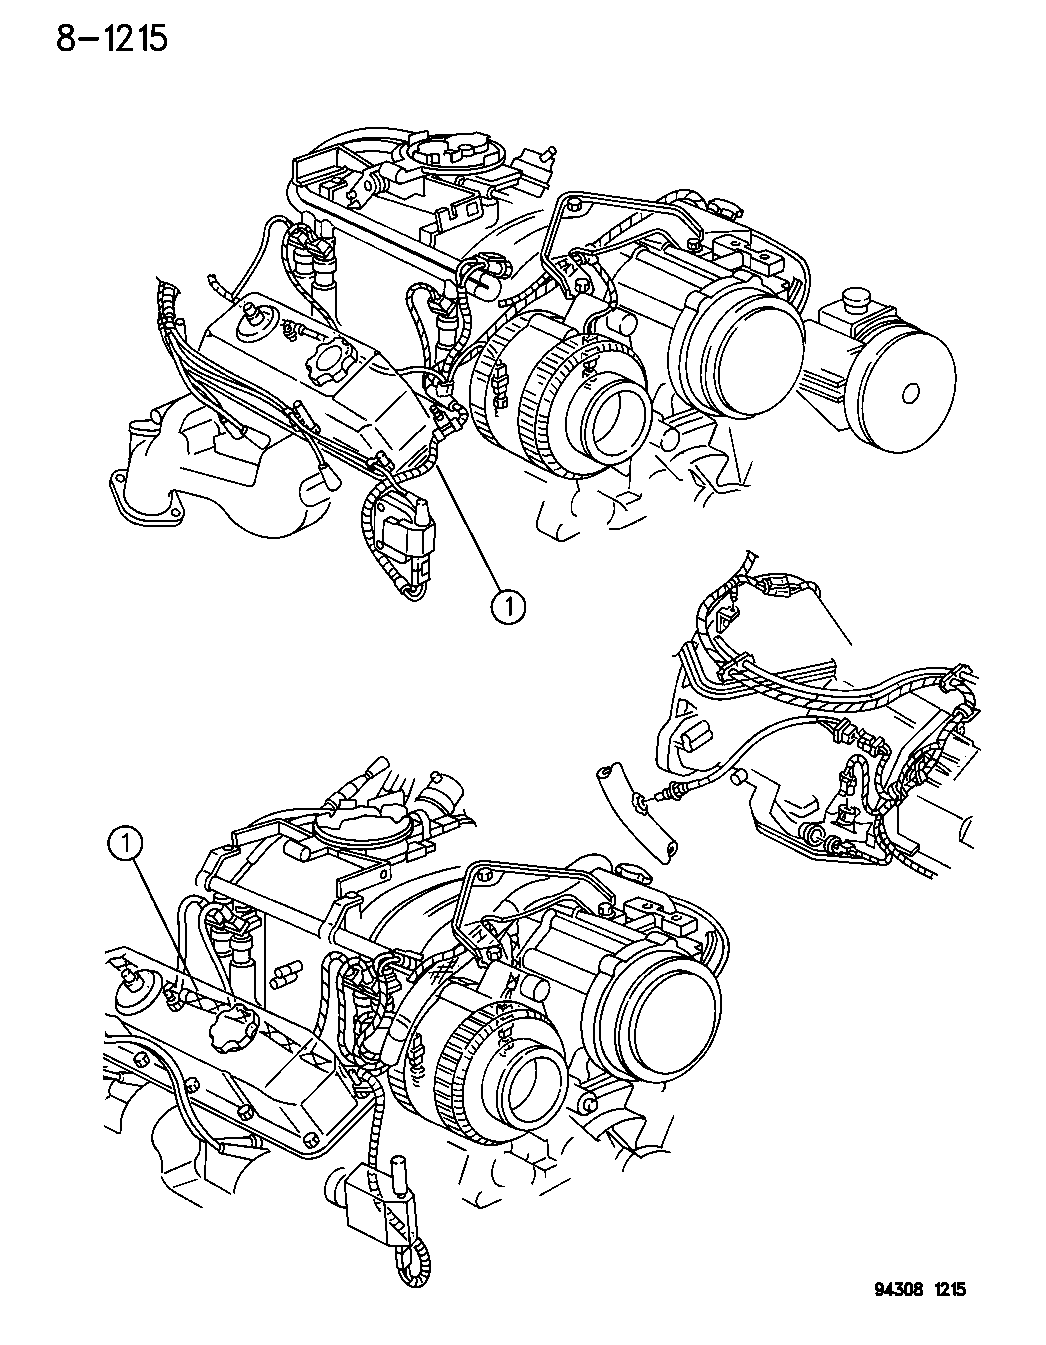 1995 dodge ram van wiring - engine